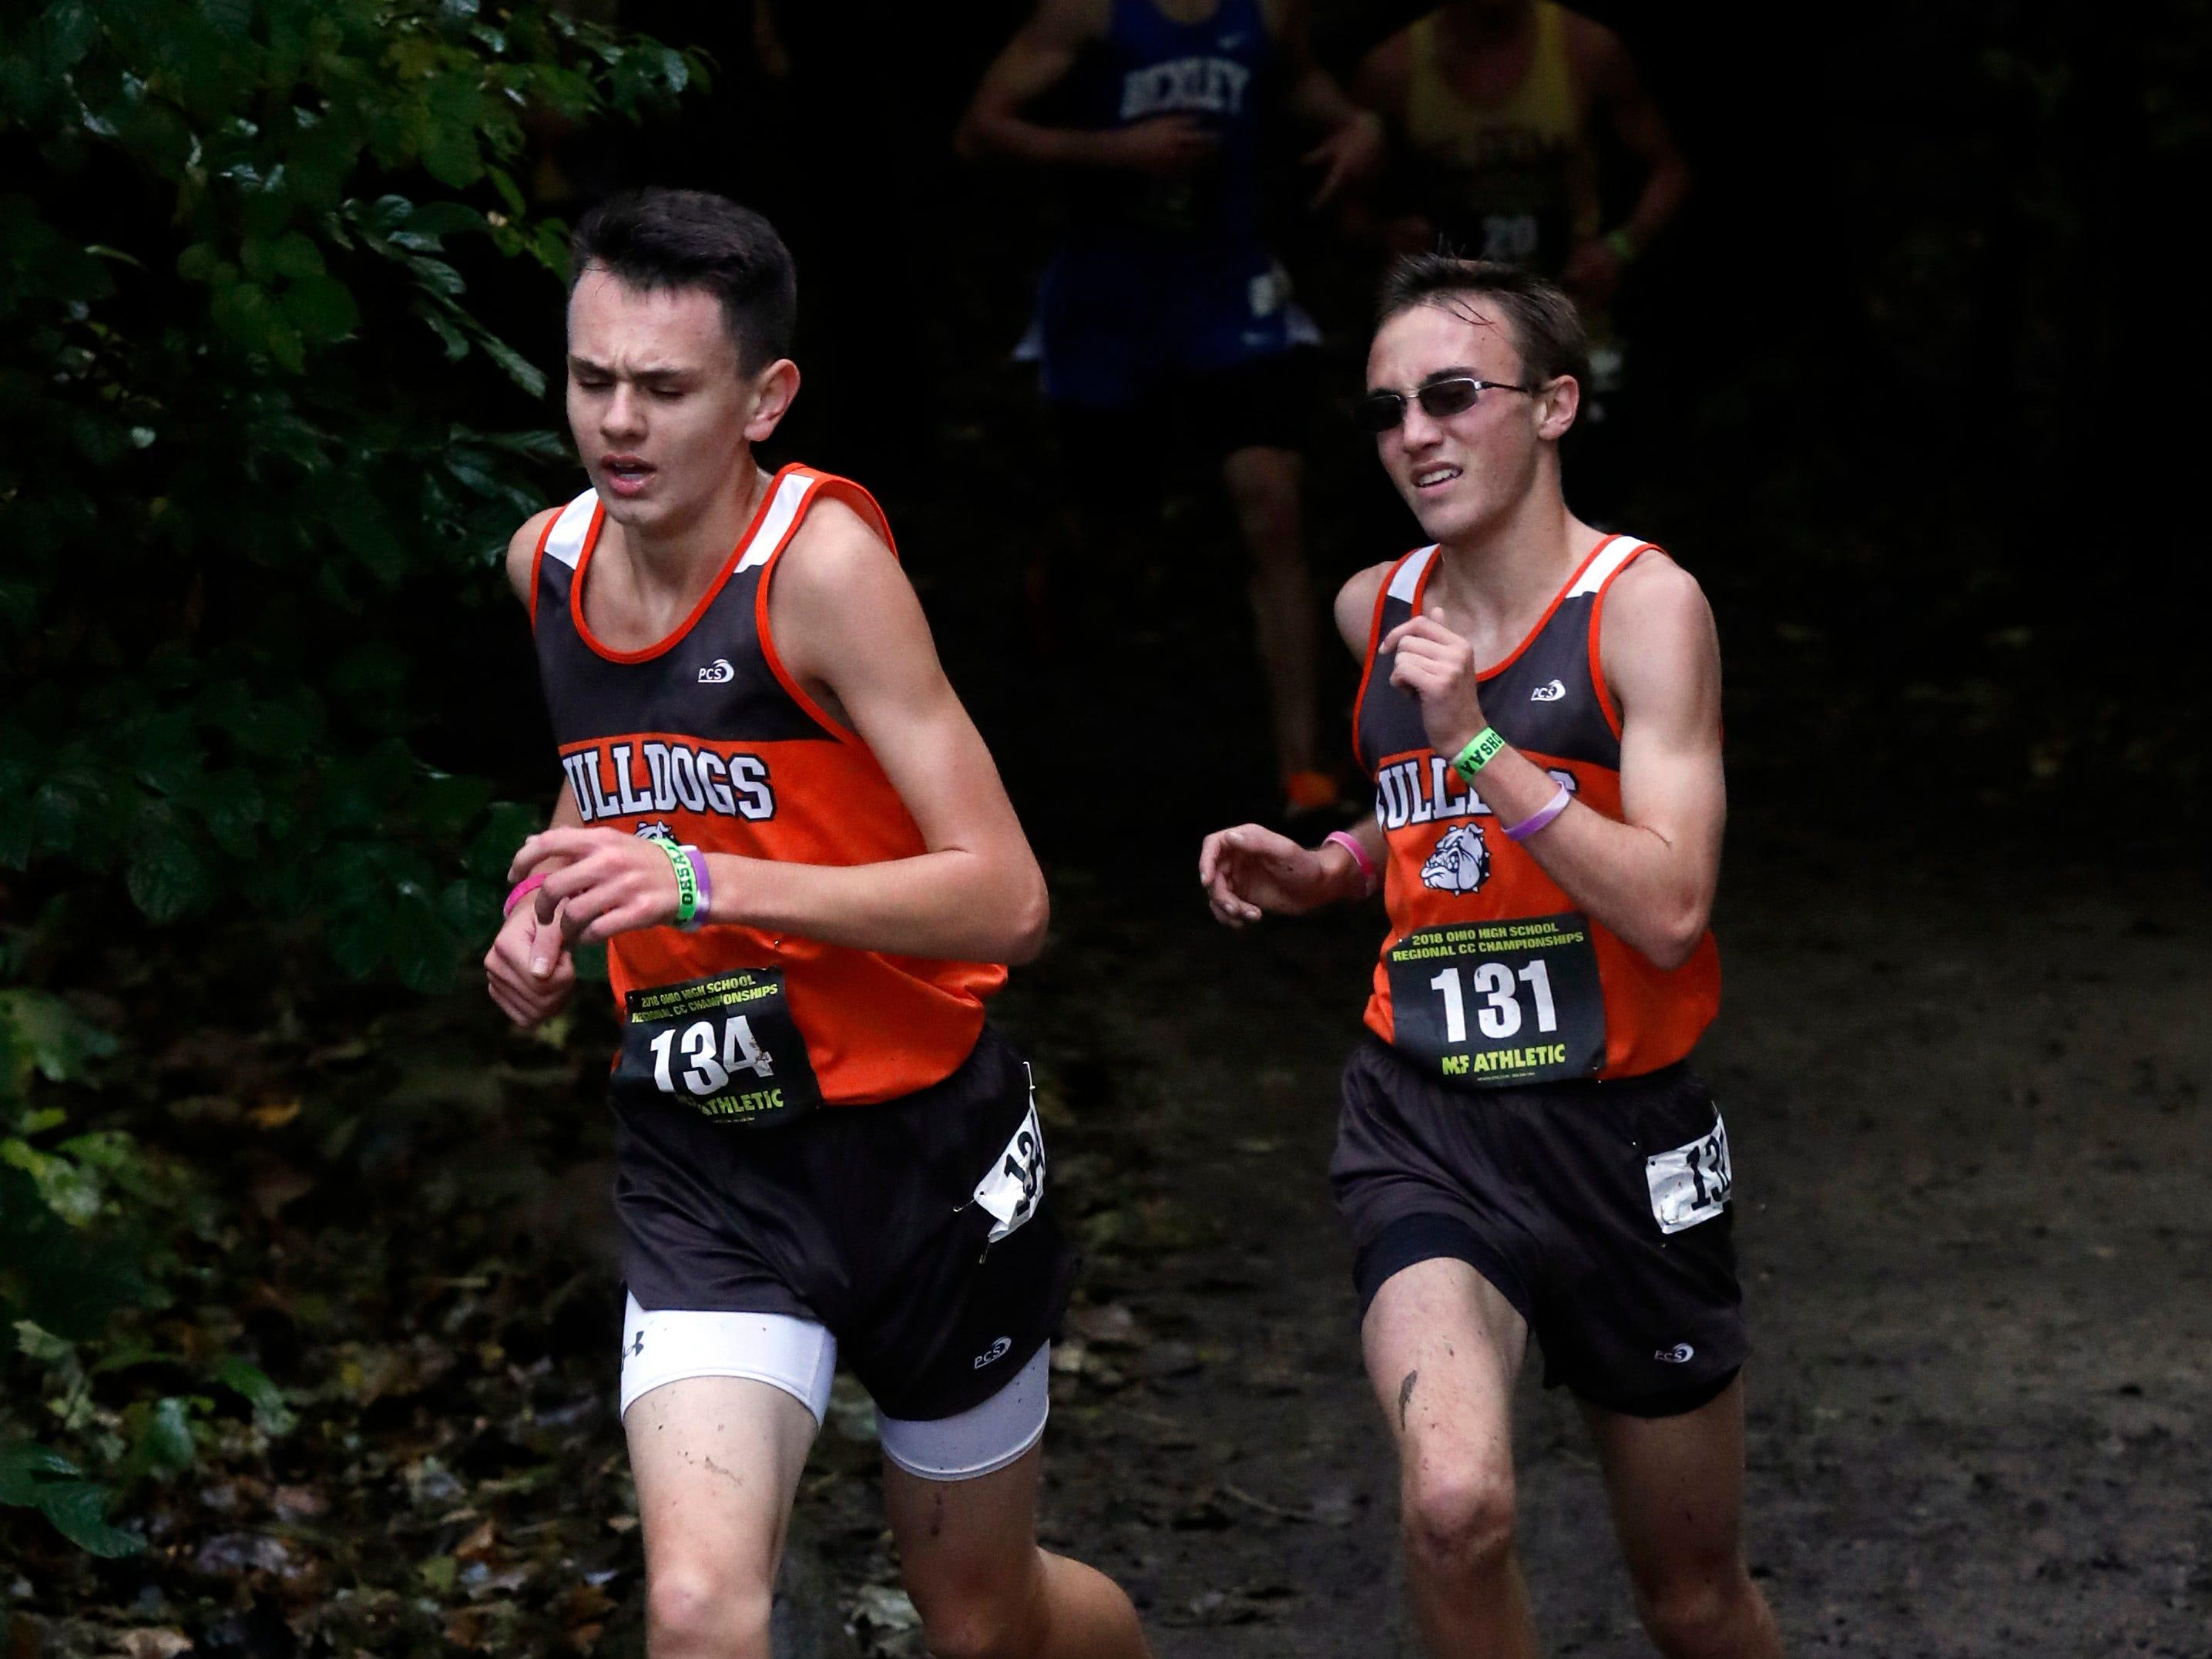 Heath's Jack Lutz, left, and Paul Collier run in the Regional Cross Country meet Saturday, Oct. 27, 2018, at Pickerington North High School in Pickerington.